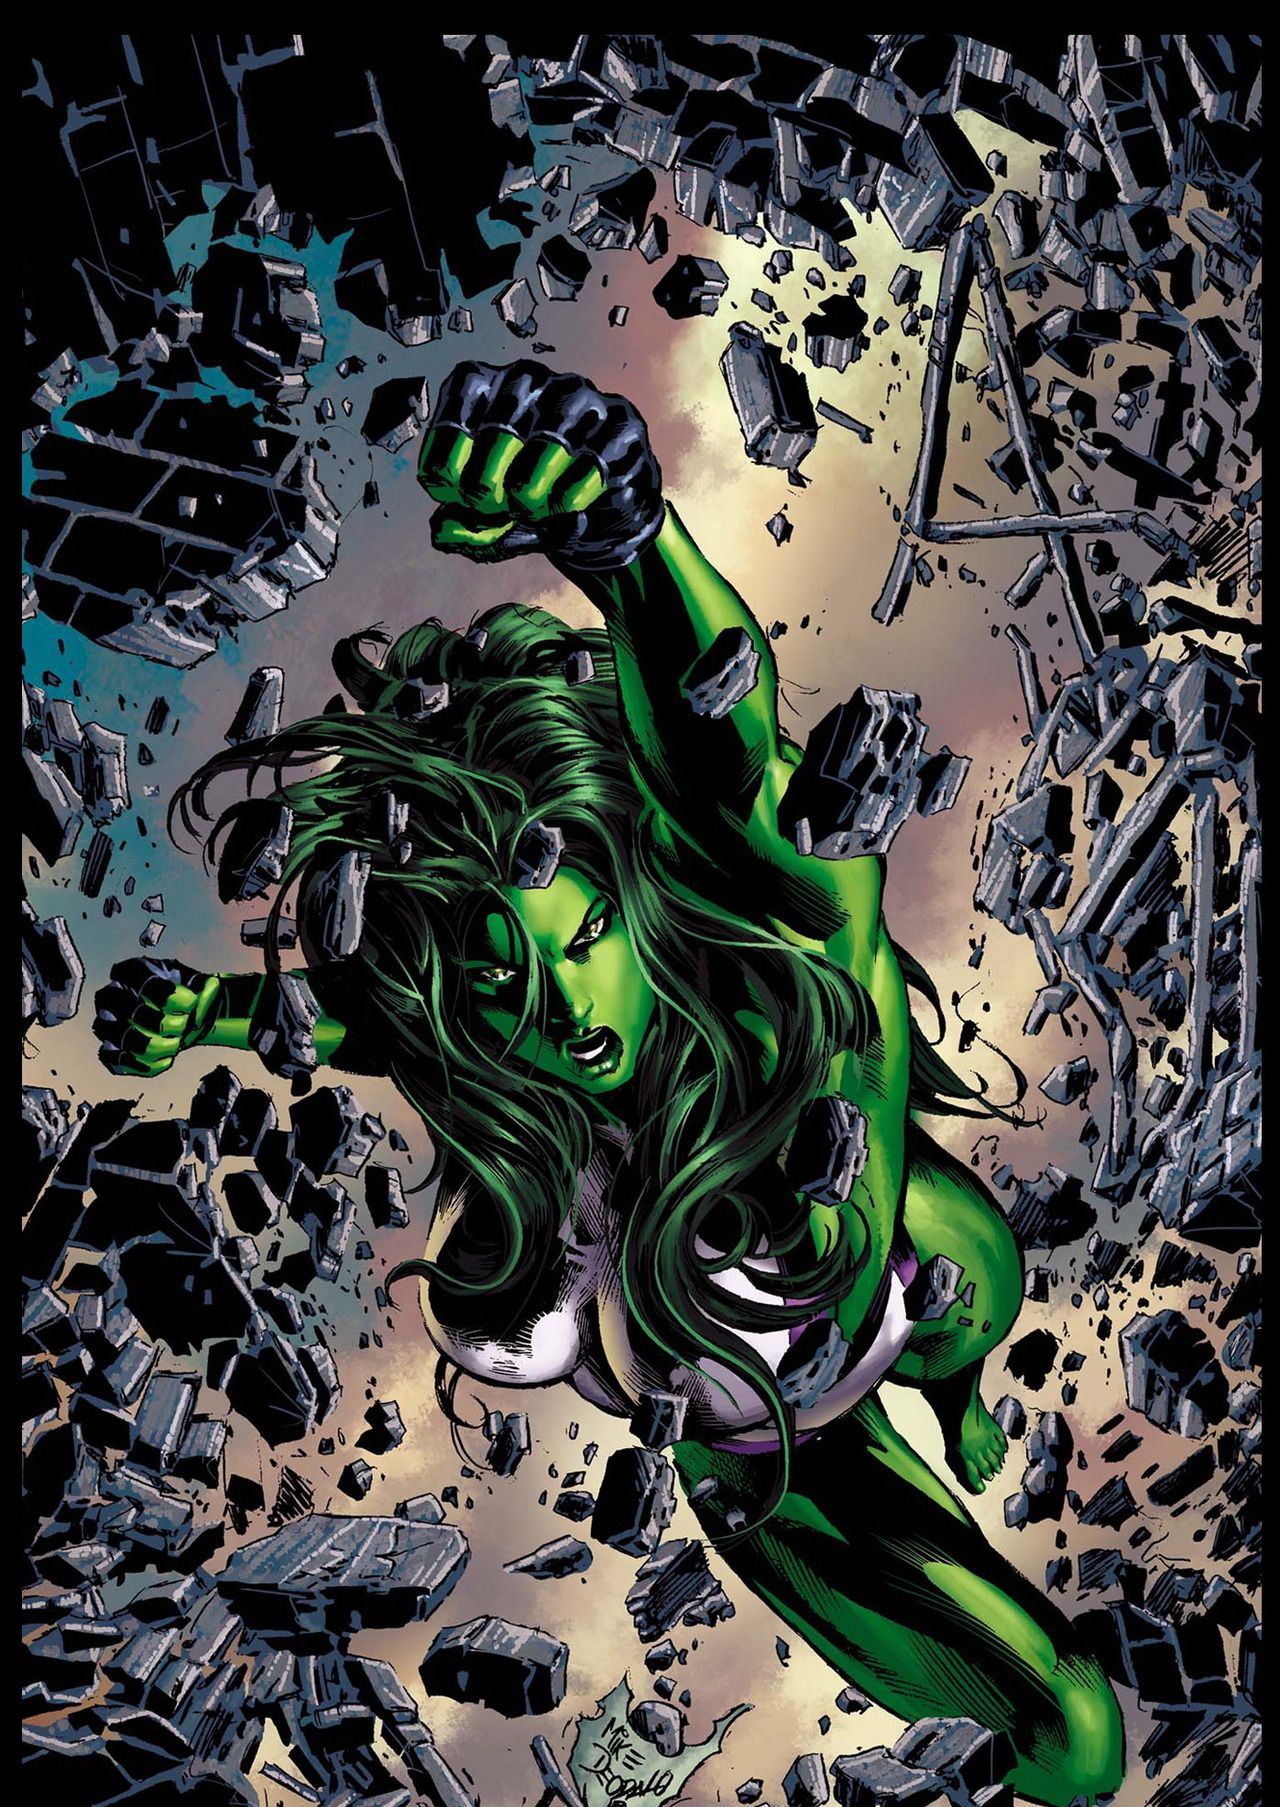 She-Hulk (With images) | Shehulk, Marvel heroes, Superhero comic